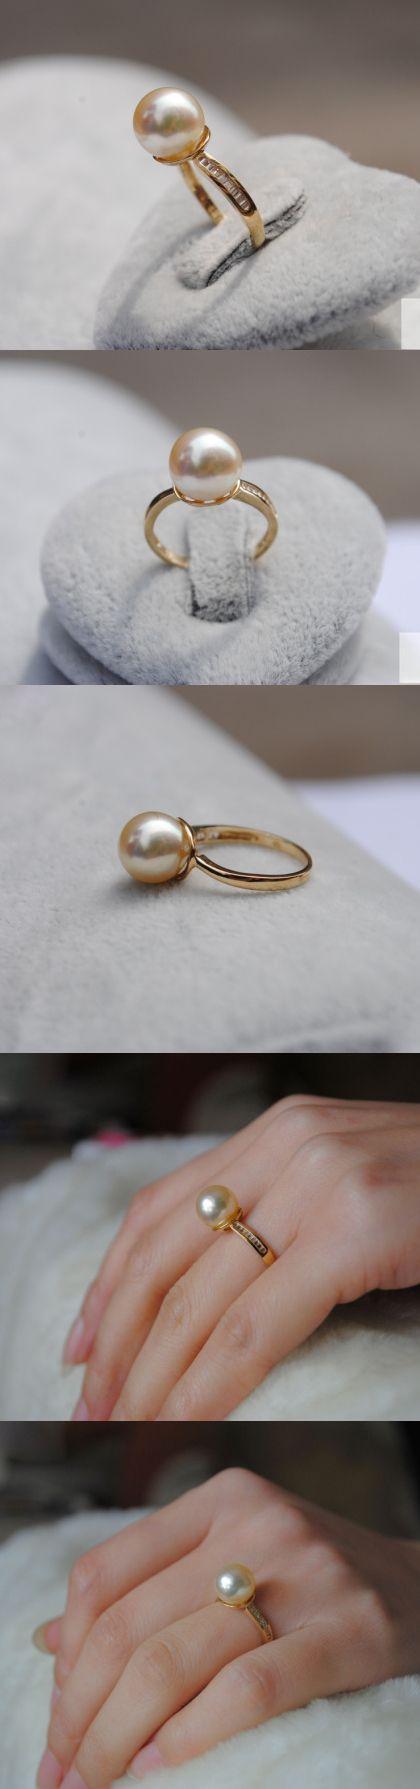 Best 25 tiffany bead bracelet ideas on pinterest for New mom jewelry tiffany